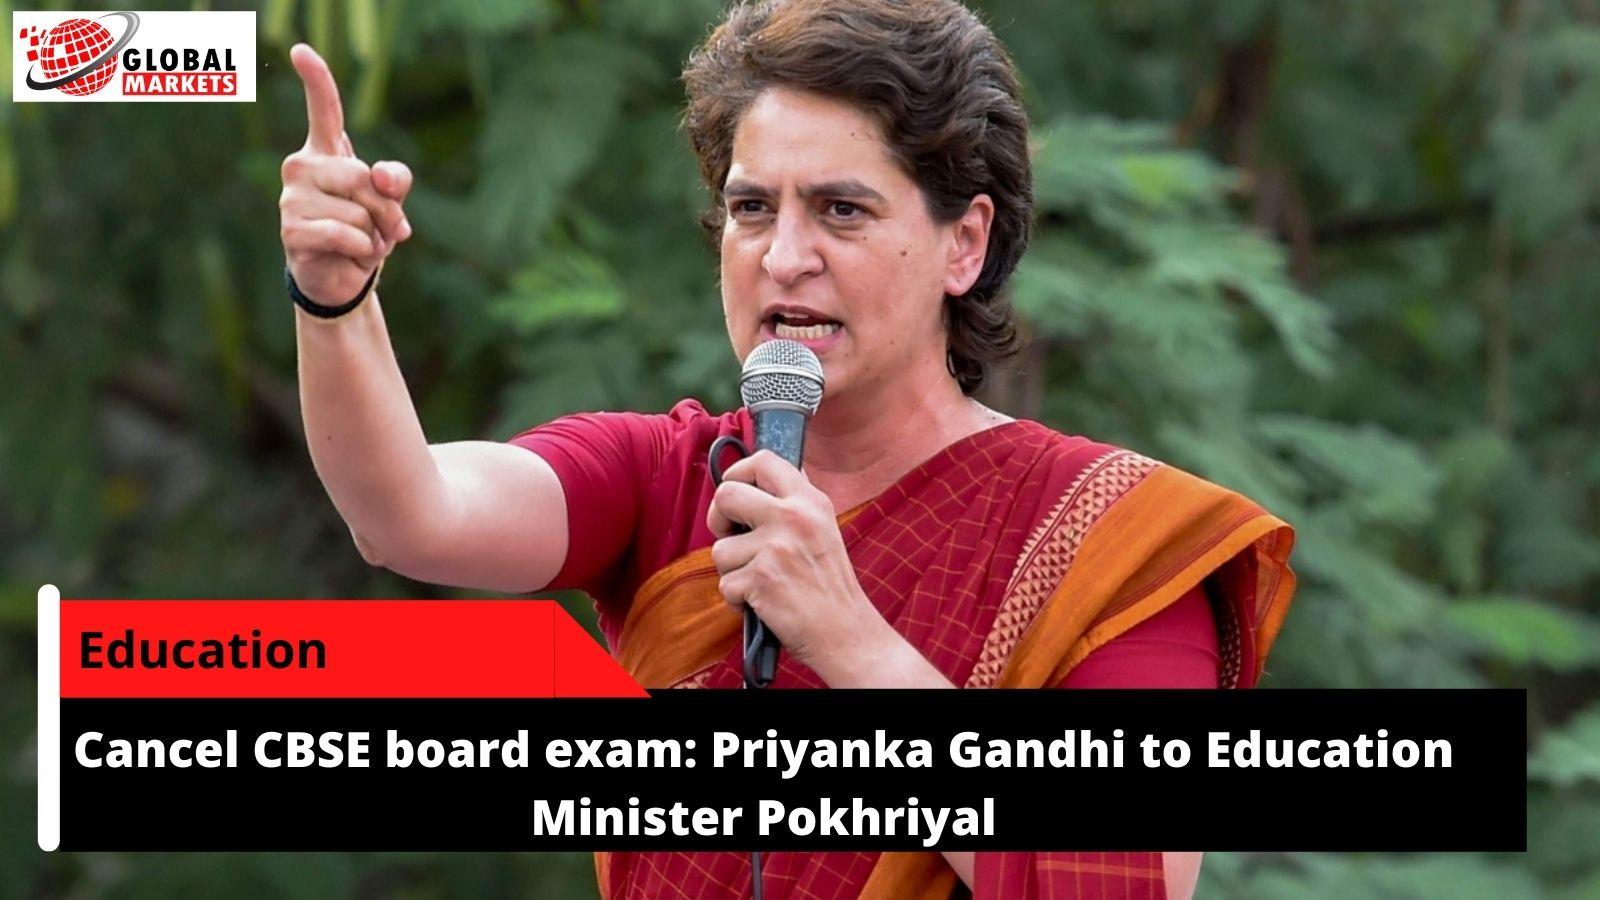 Cancel CBSE board exam: Priyanka Gandhi to Education Minister Pokhriyal